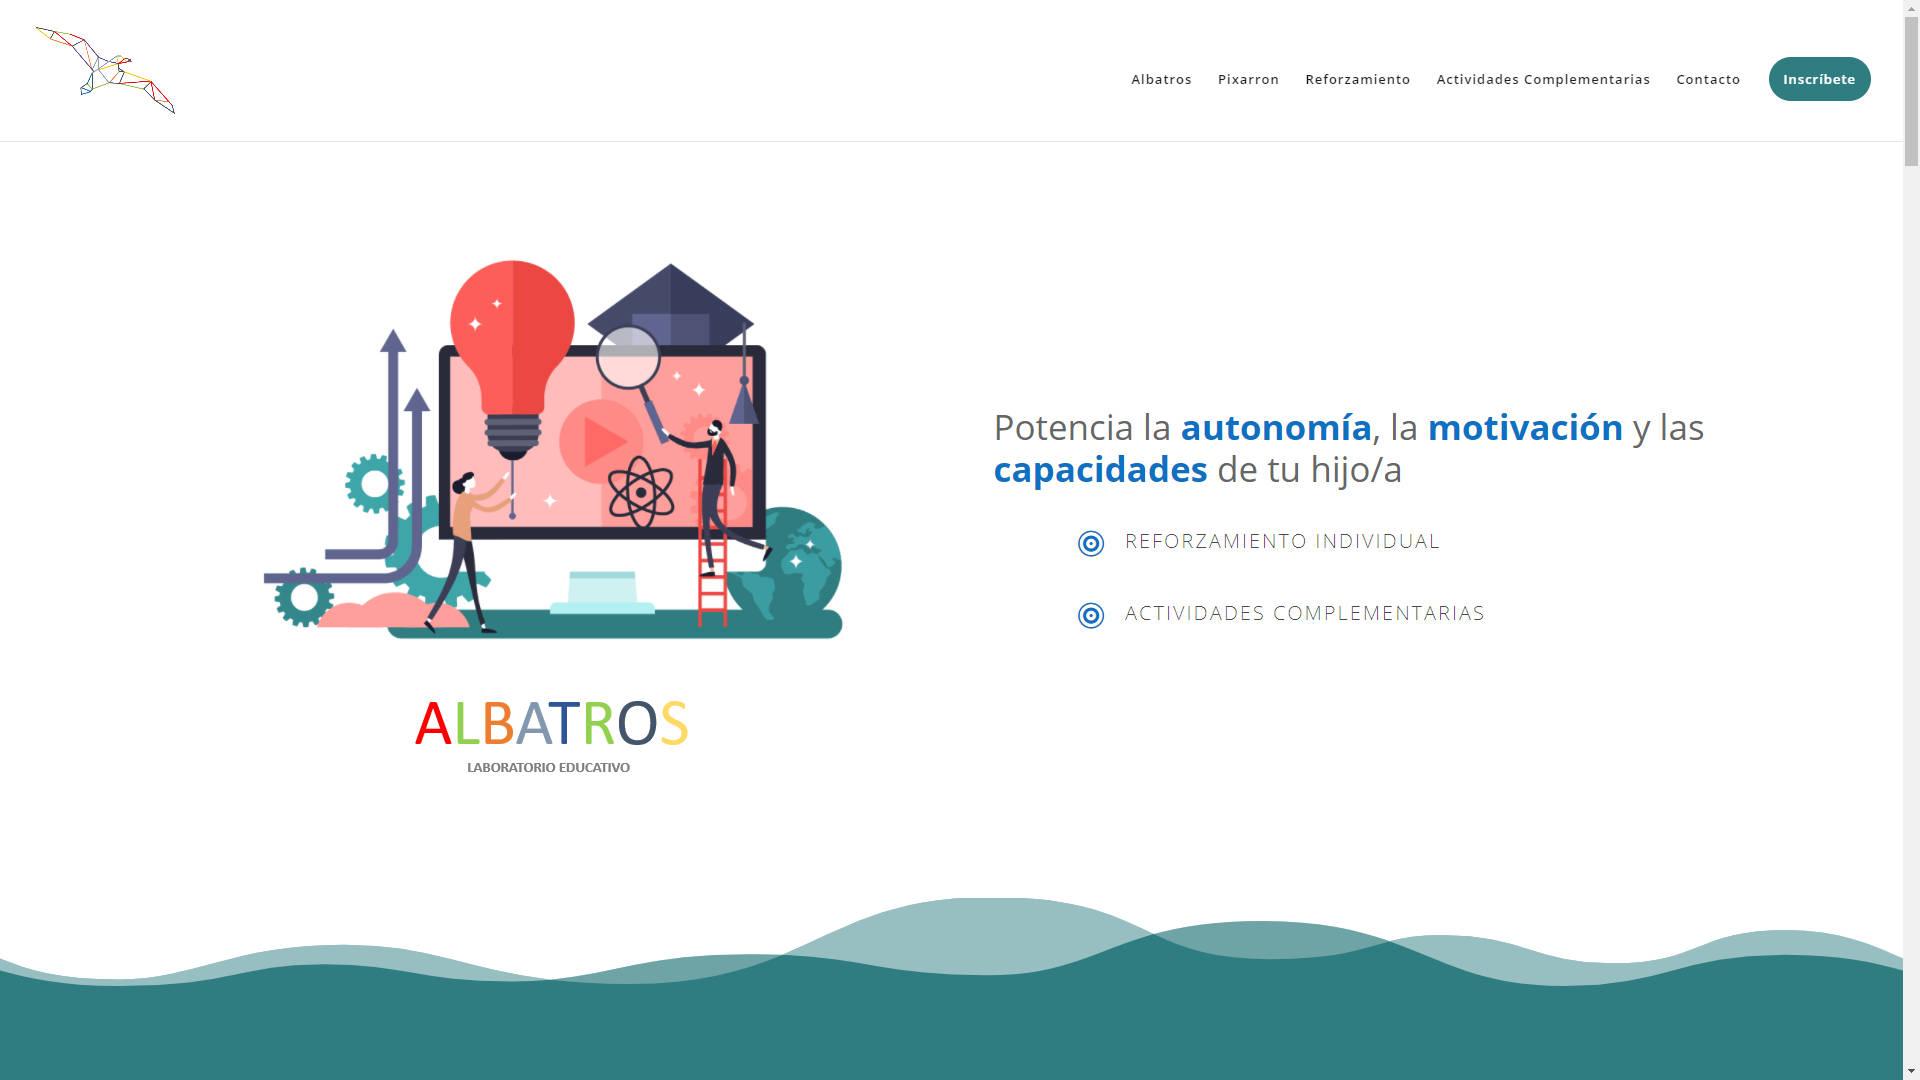 Albatros Laboratorio Educacional